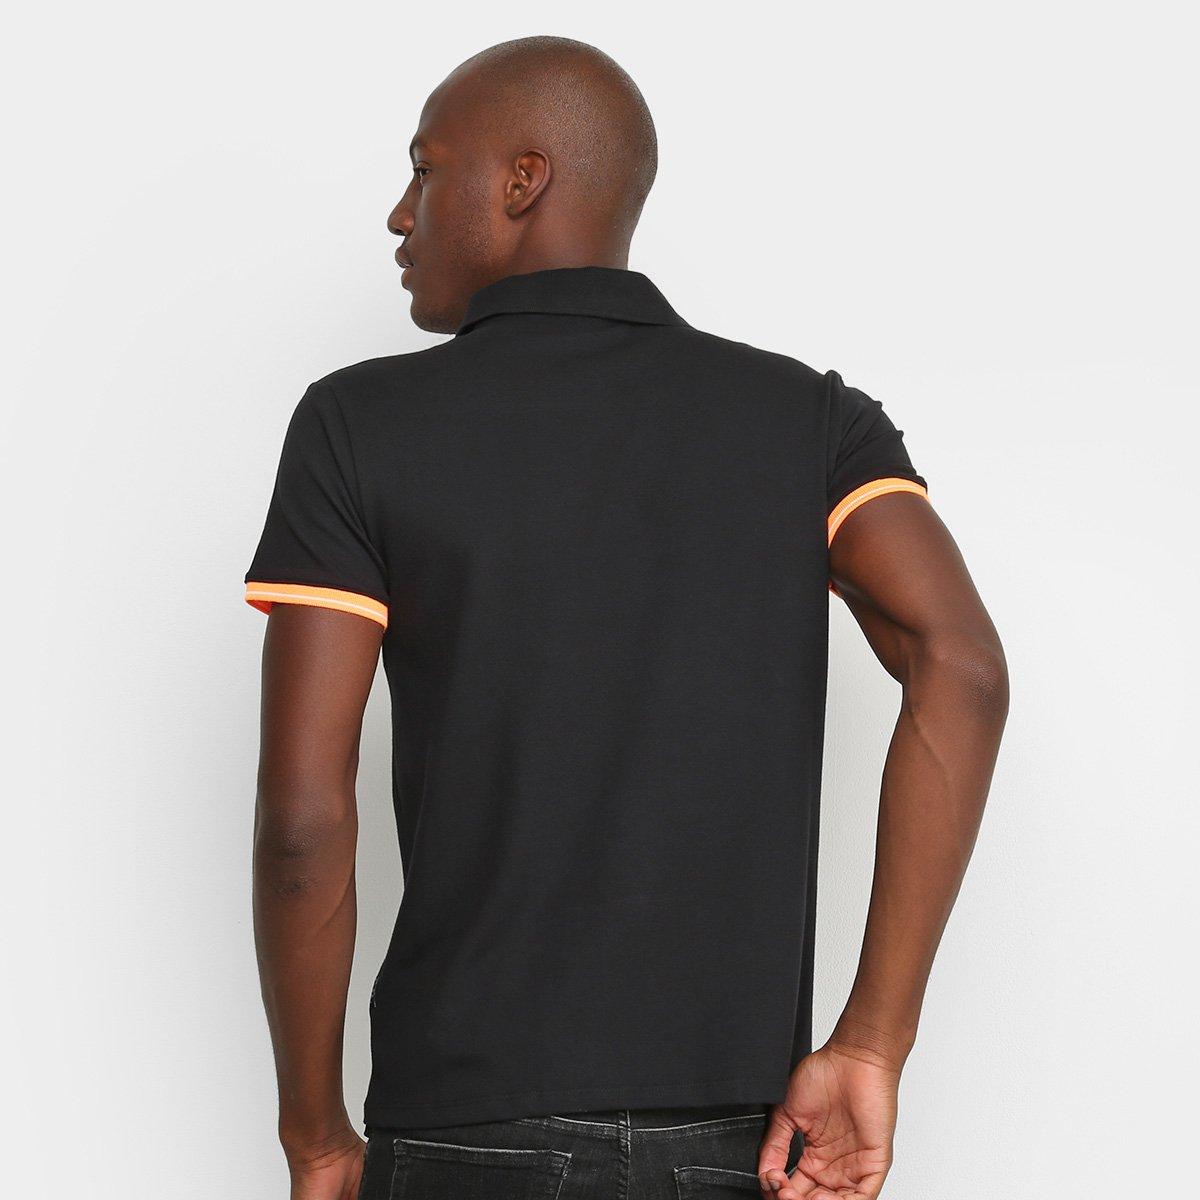 Camisa Polo Replay Detalhes Neon Masculina - Preto